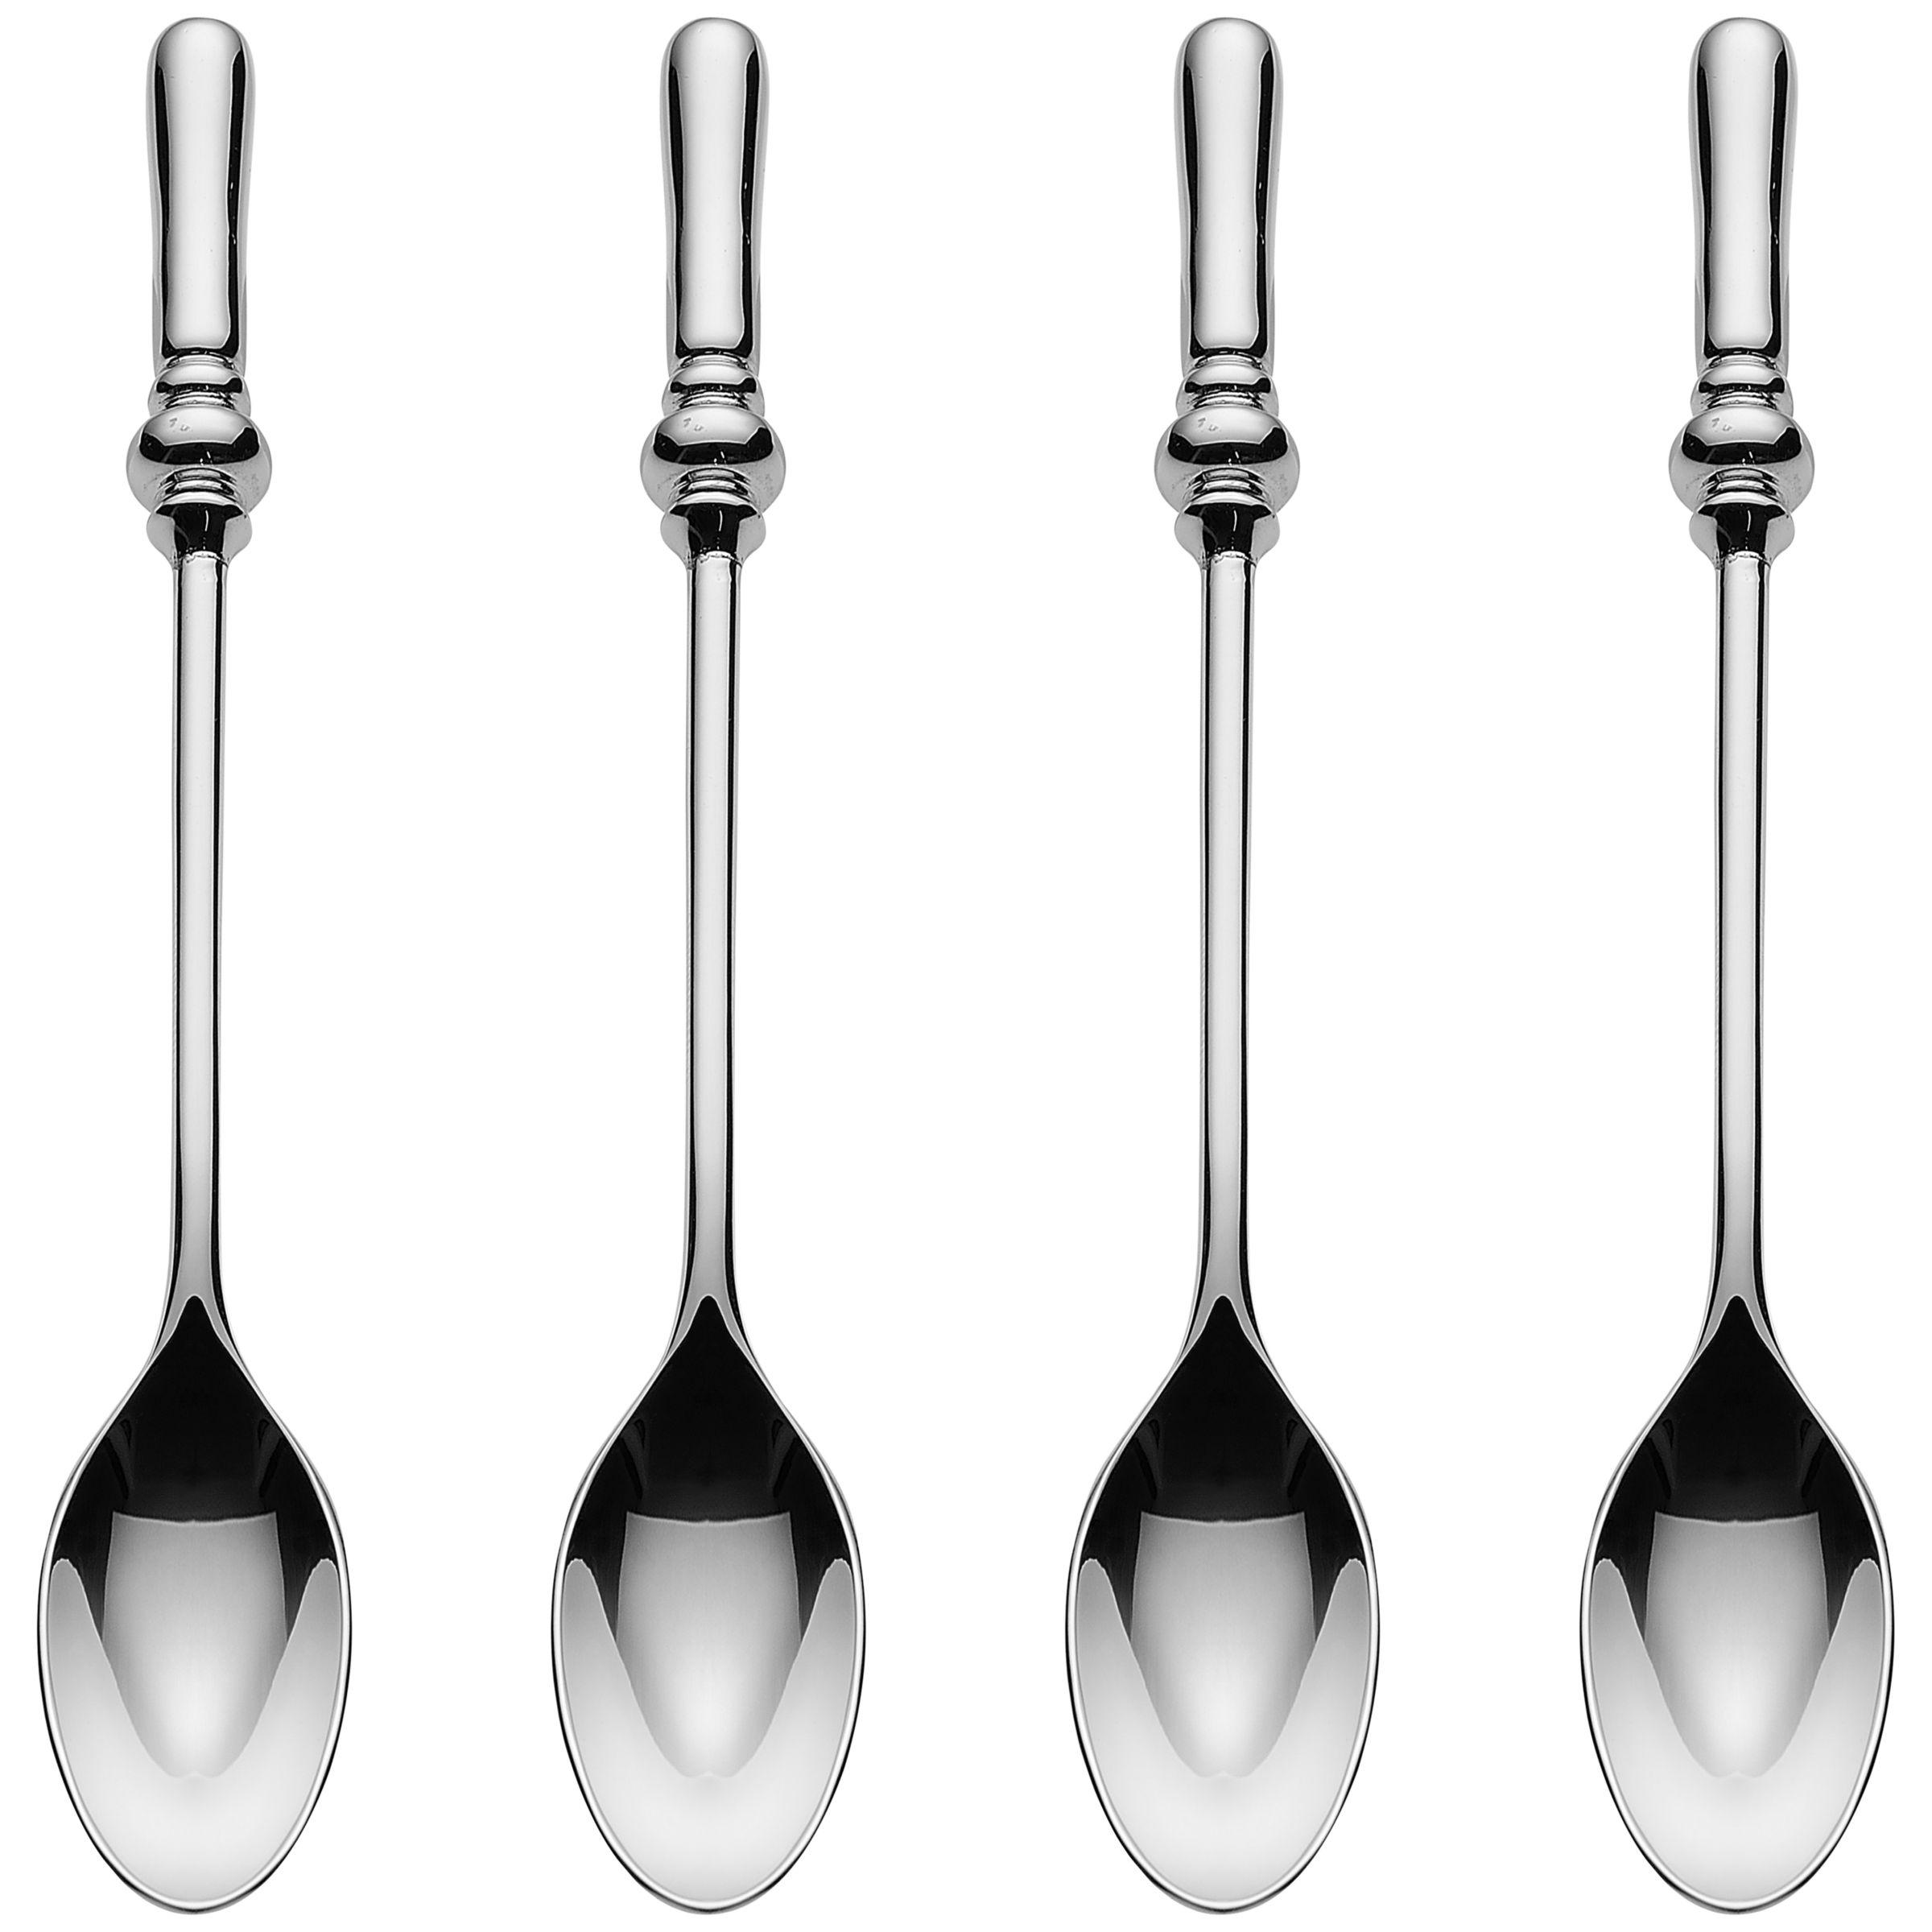 Alessi Alessi Dressed Coffee Spoons, Stainless Steel, Set of 4